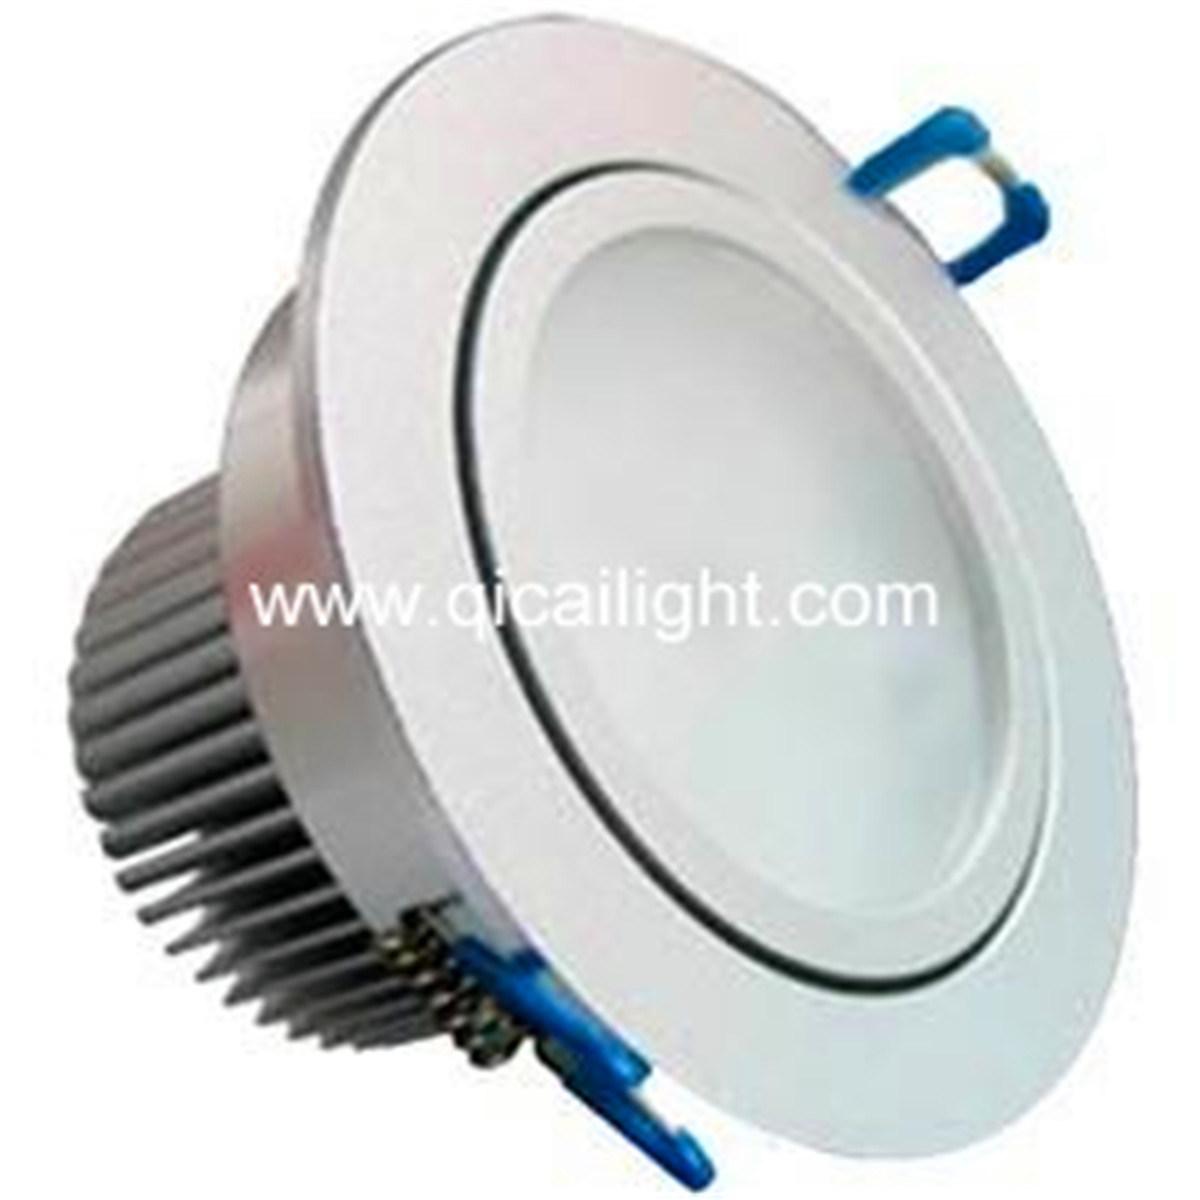 6X1W High Power LED Downlight